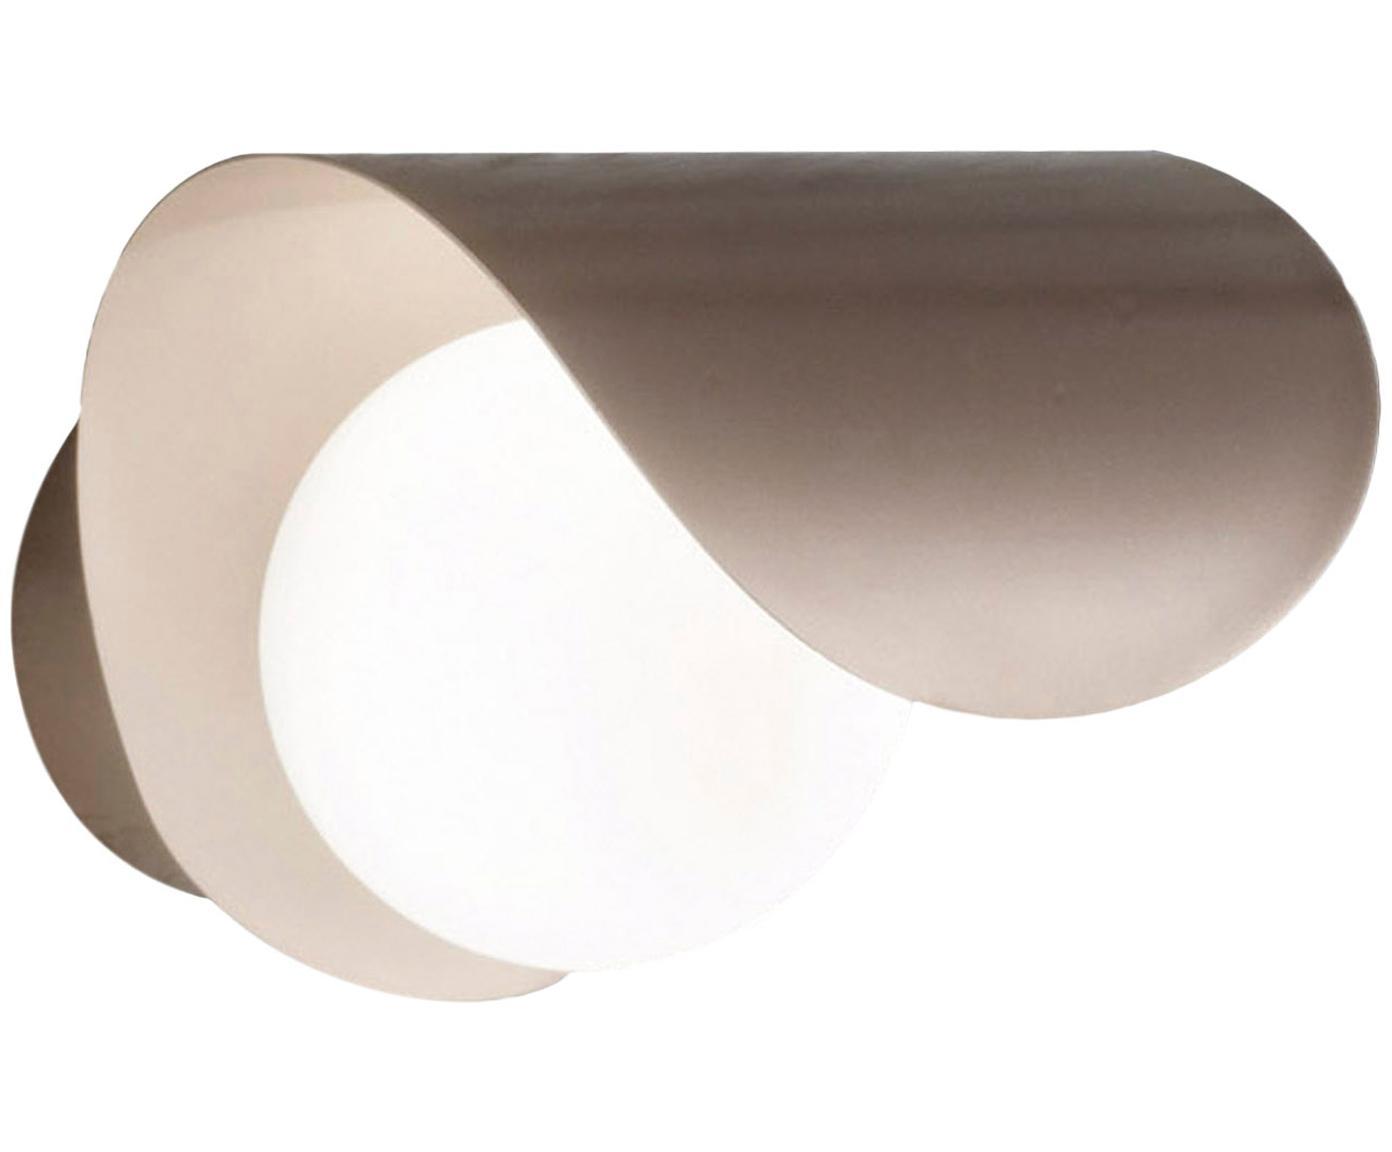 Applique Adria, Paralume: vetro opalino, Dorato, bianco opalino, Larg. 16 x Alt. 18 cm